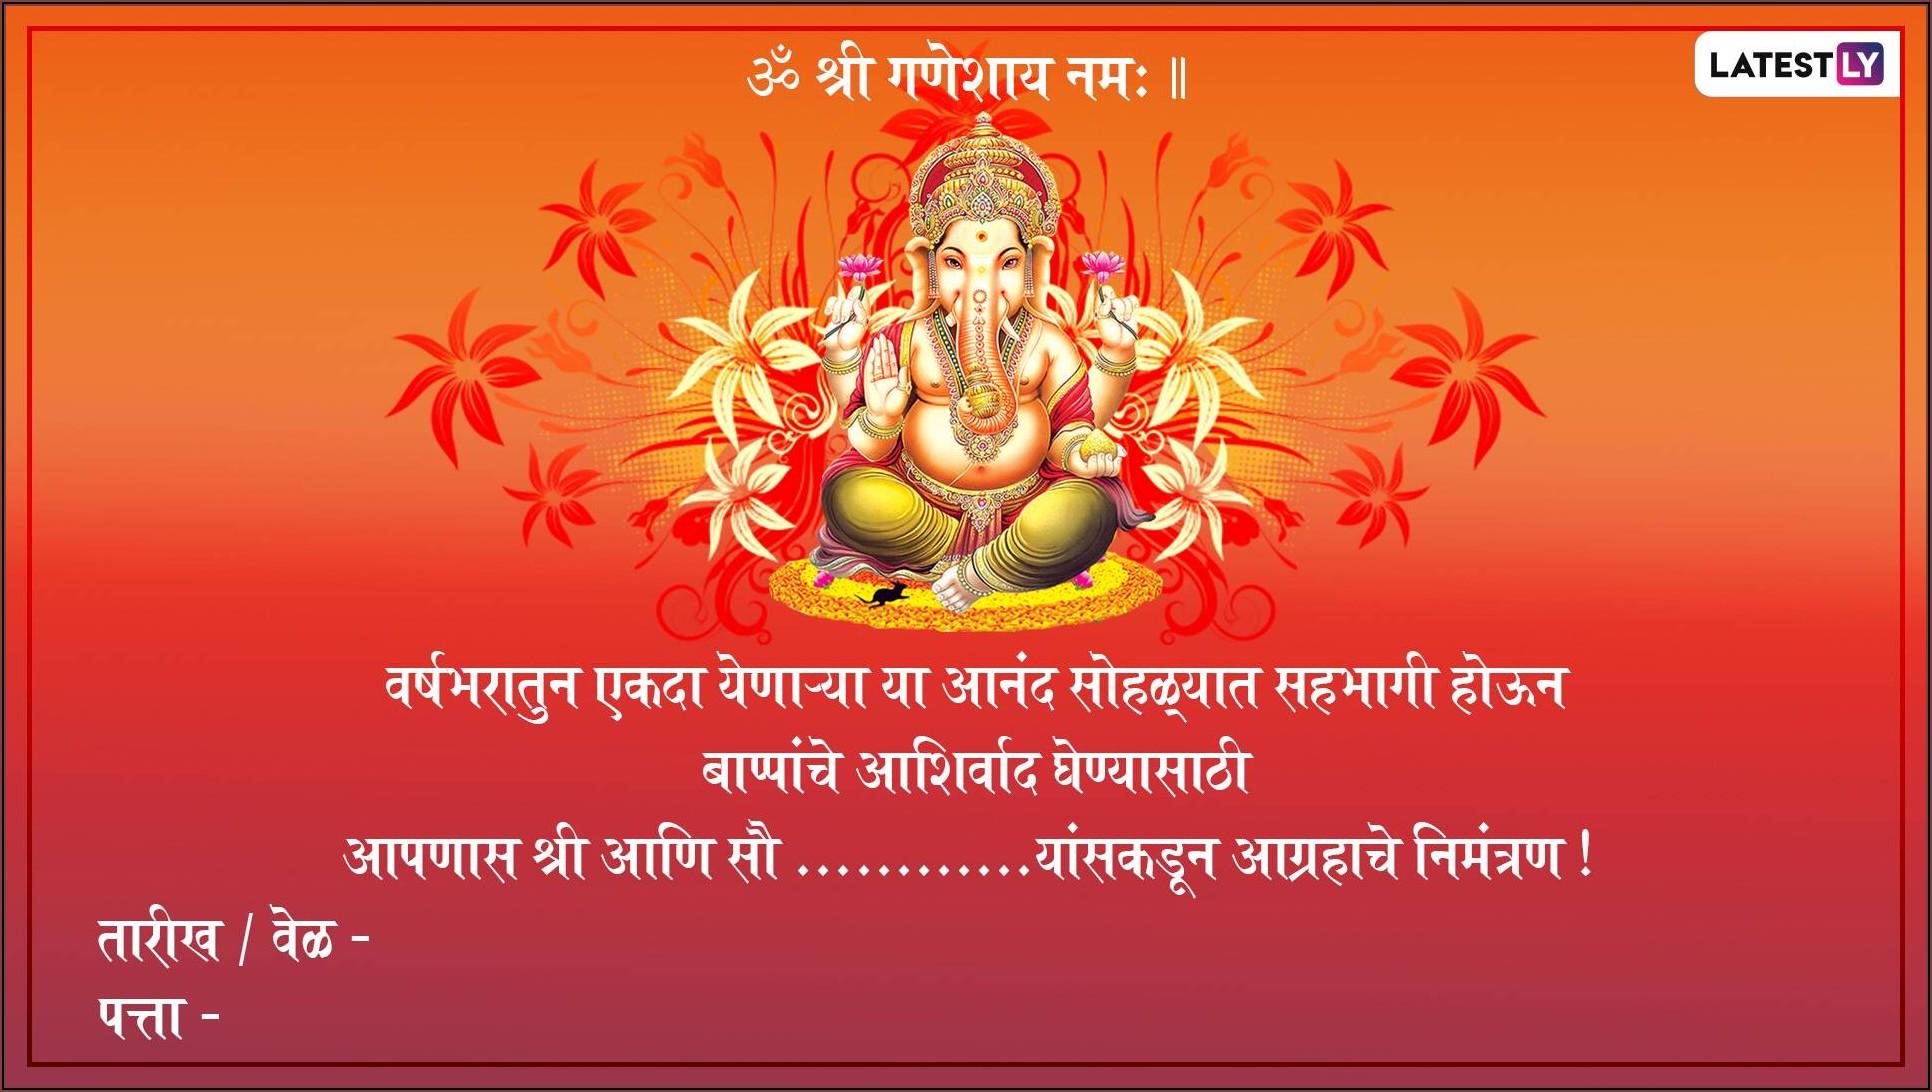 Invitation Card Format For Ganesh Puja In Marathi